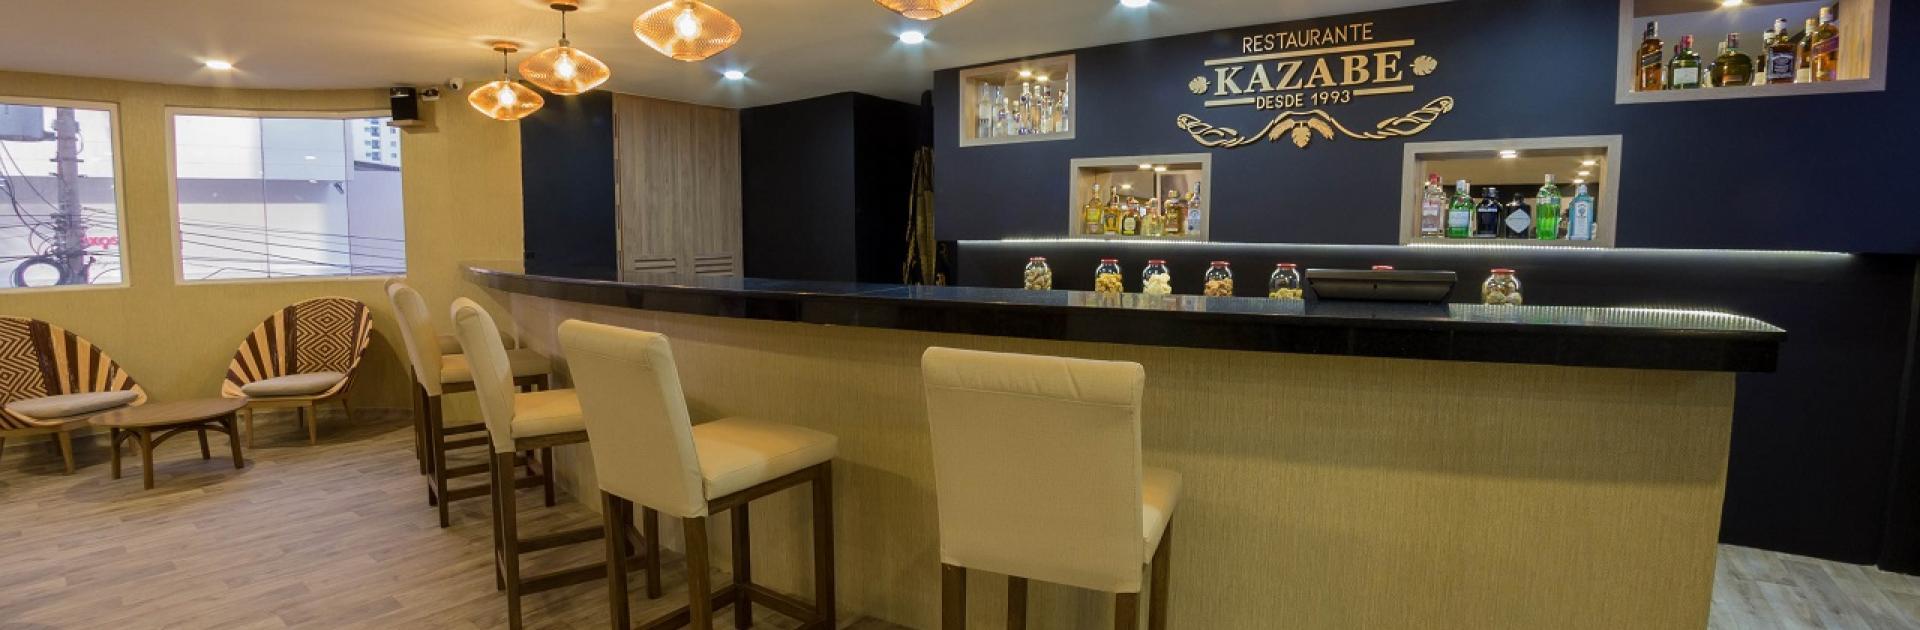 Restaurante Kazabe, participante de Dónde Restaurant Week Cartagena 2019